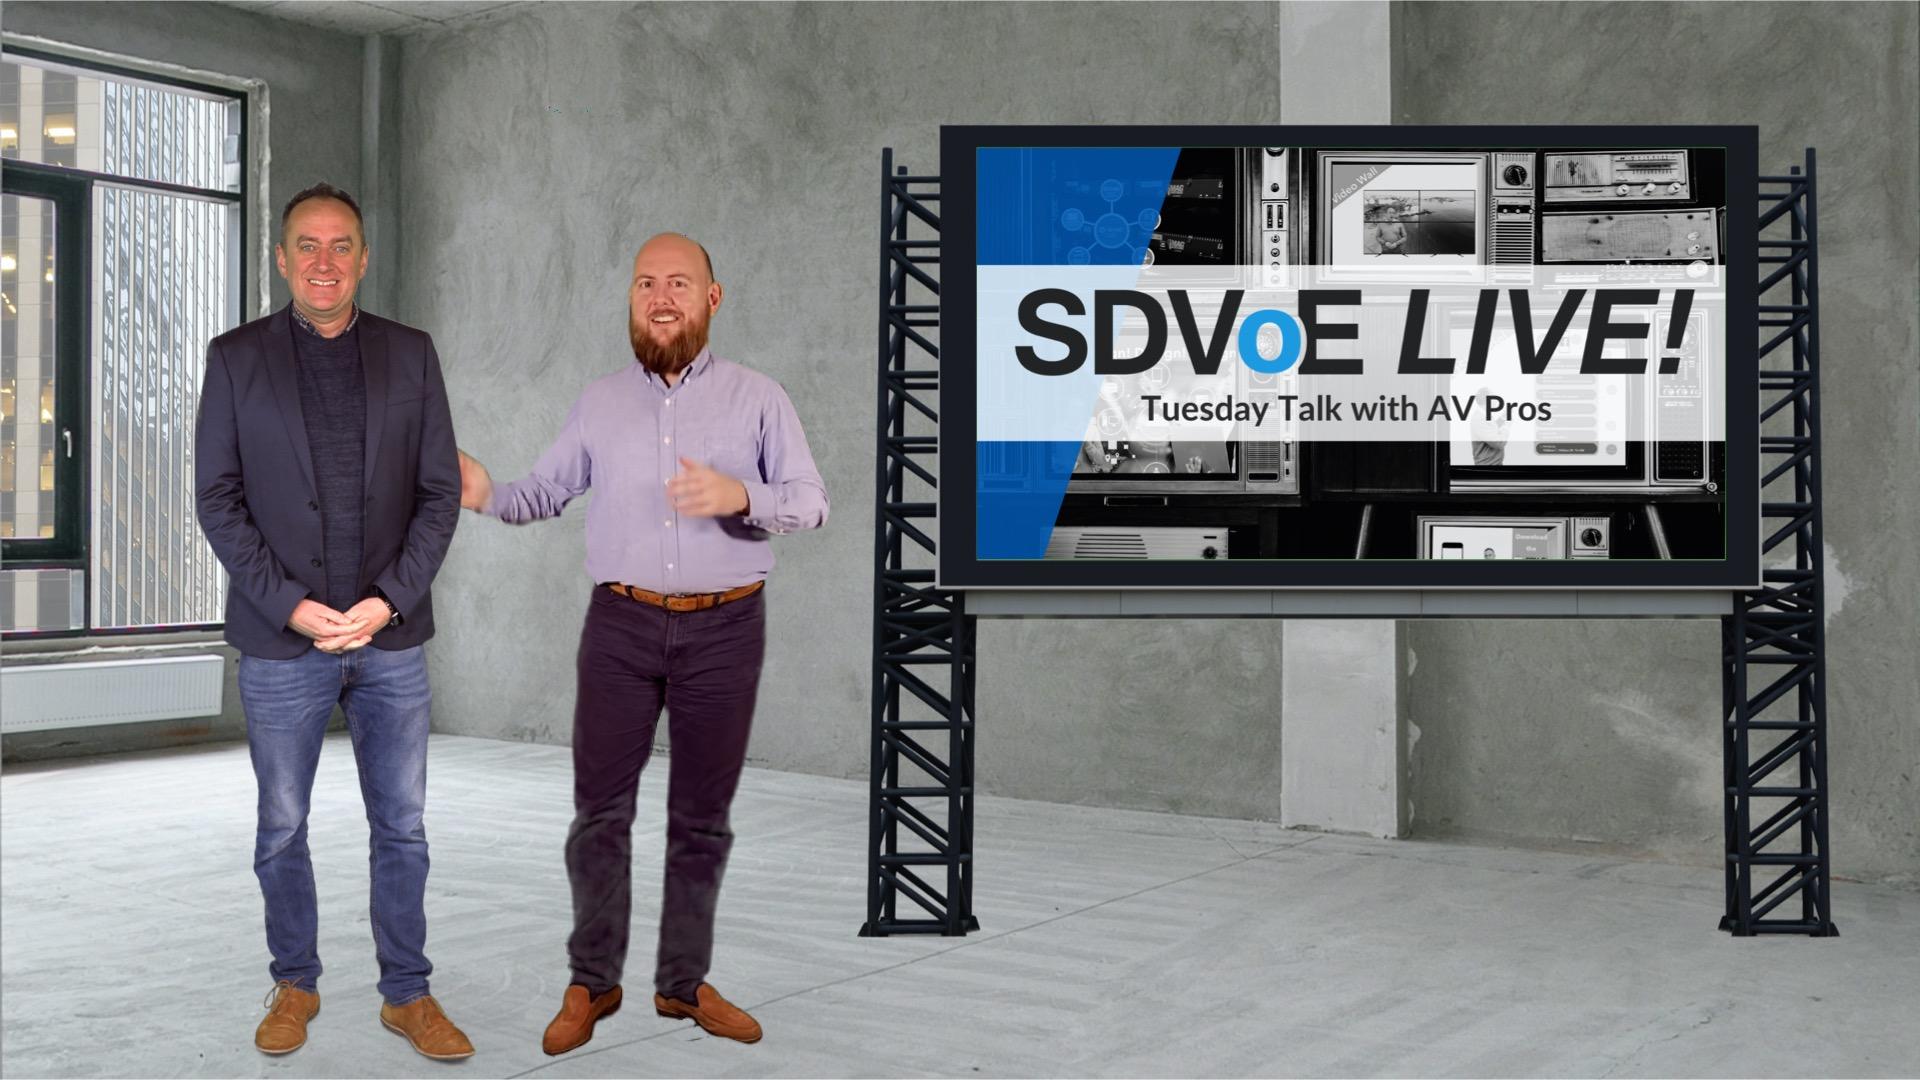 SDVoE LIVE! Episode 14: The New AV Frontier: eSports